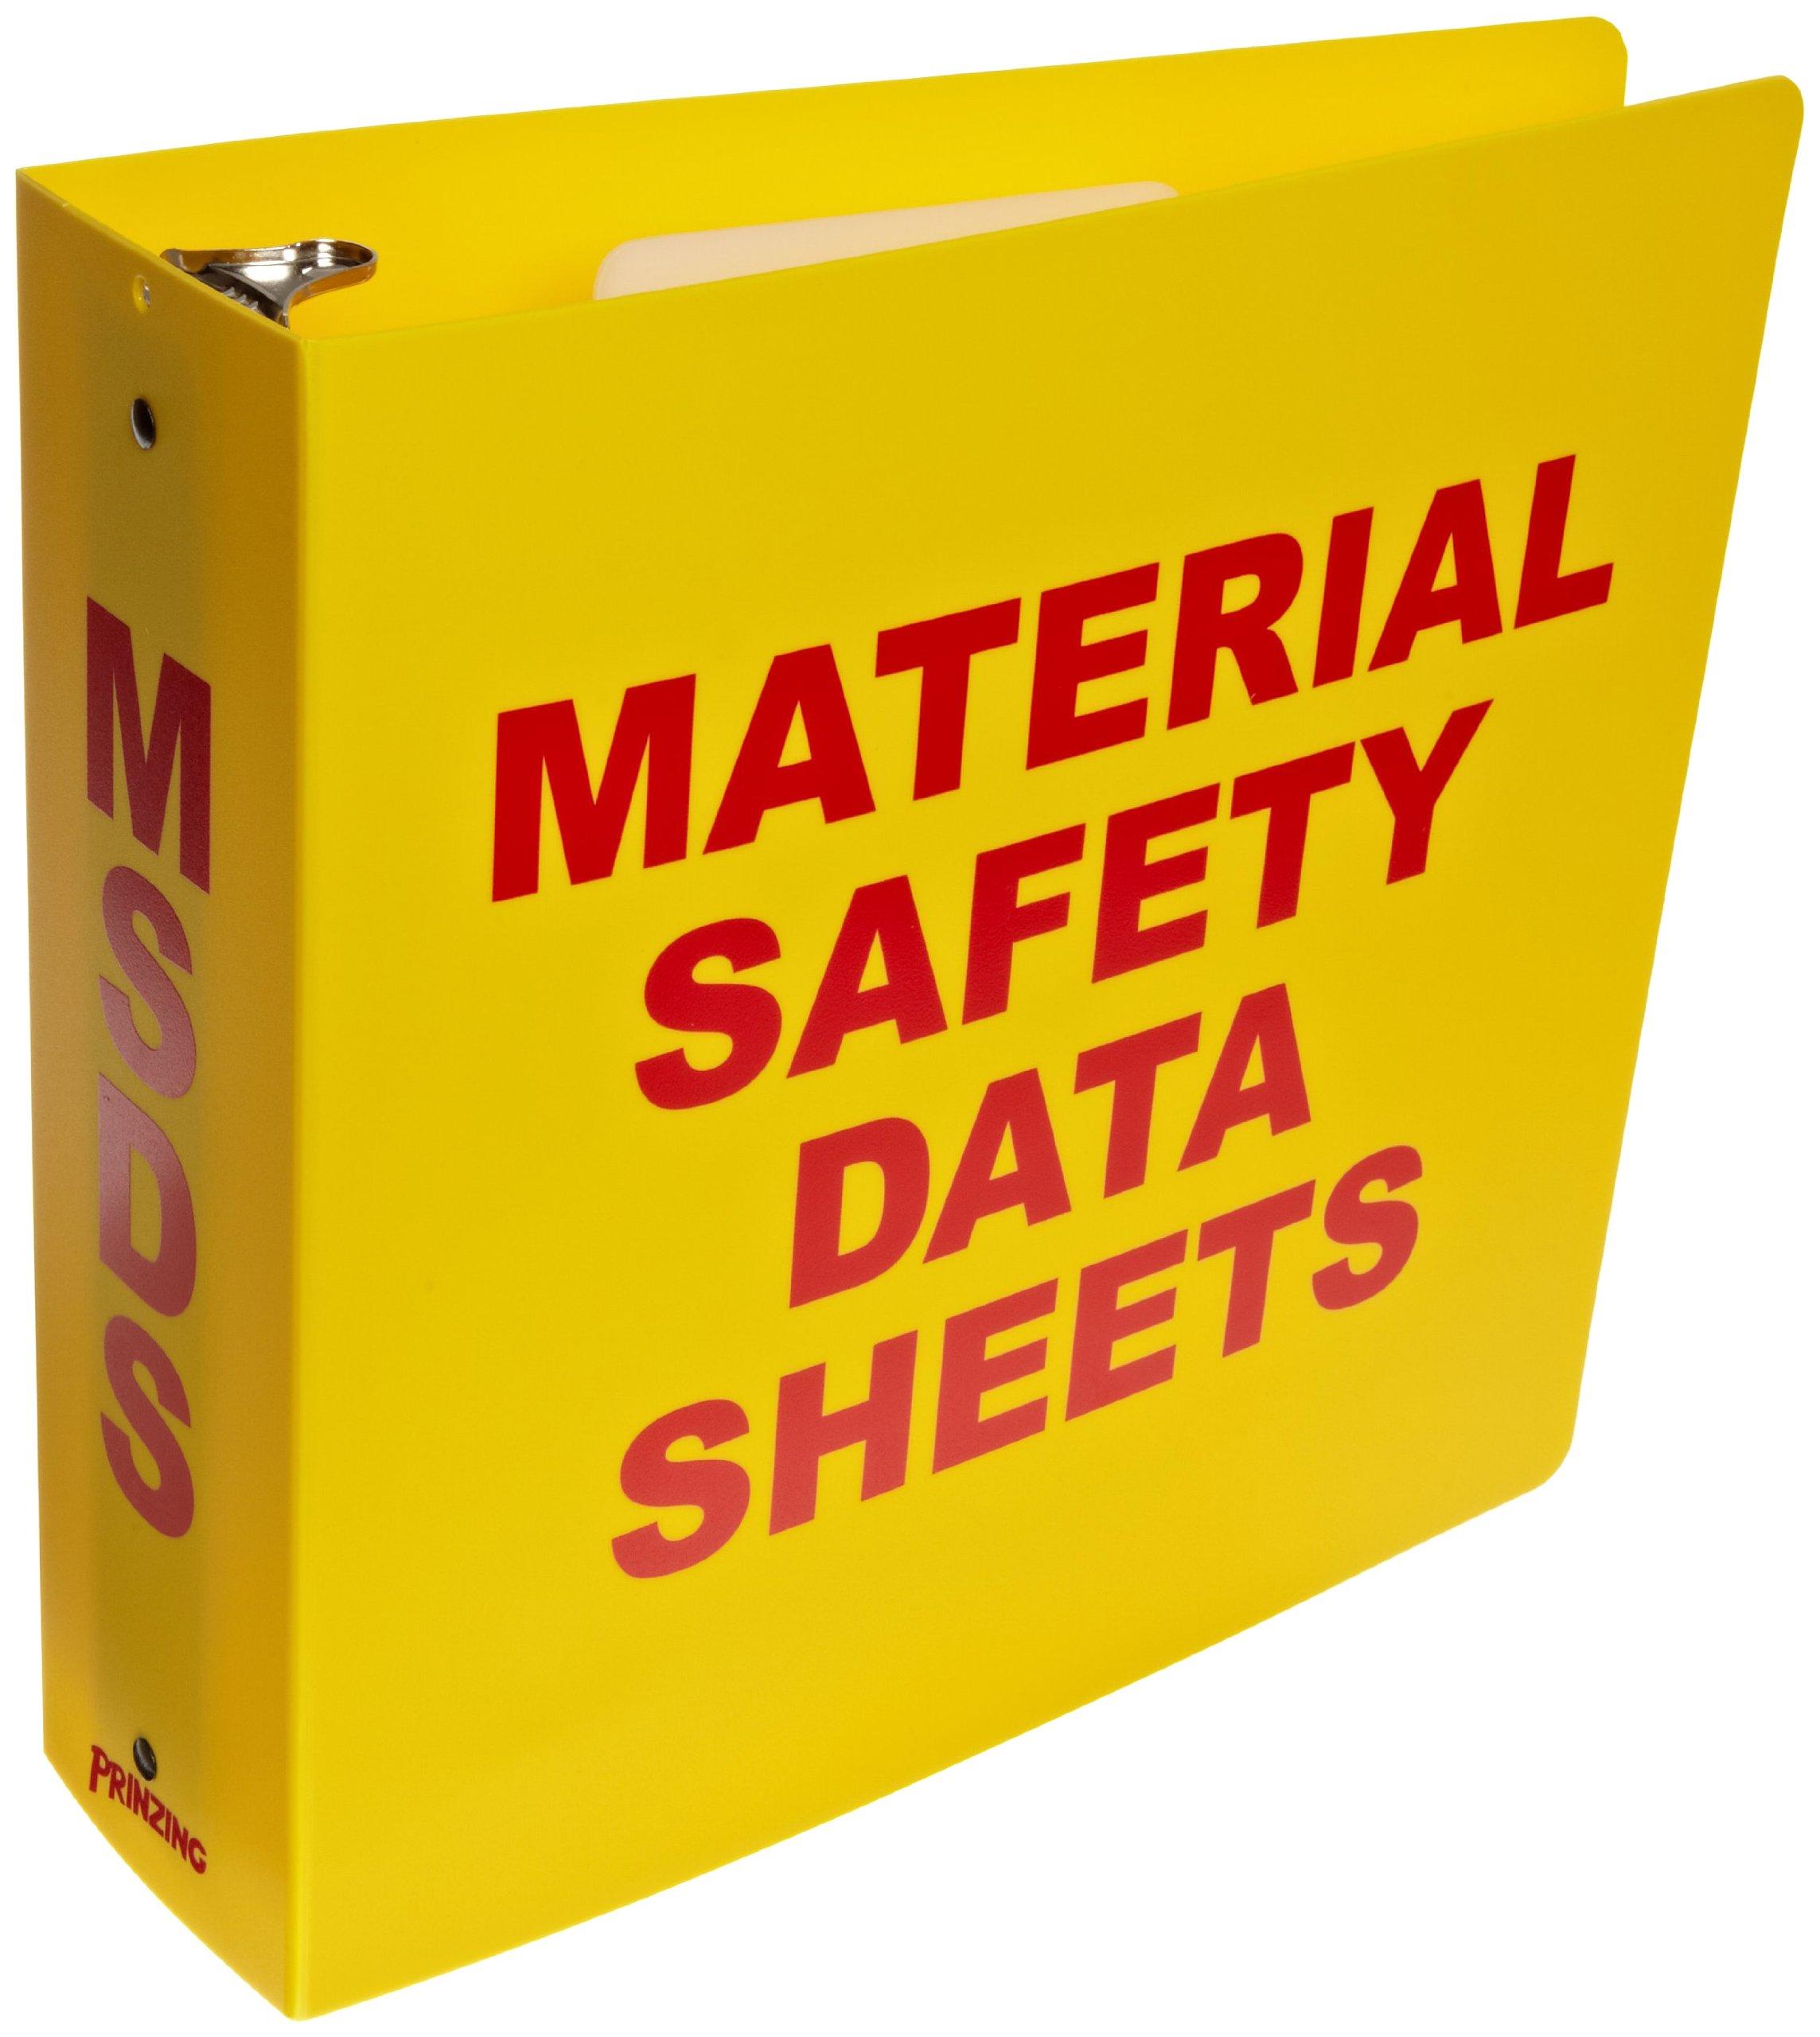 Data sheet clipart svg stock Sds clipart - ClipartFest svg stock